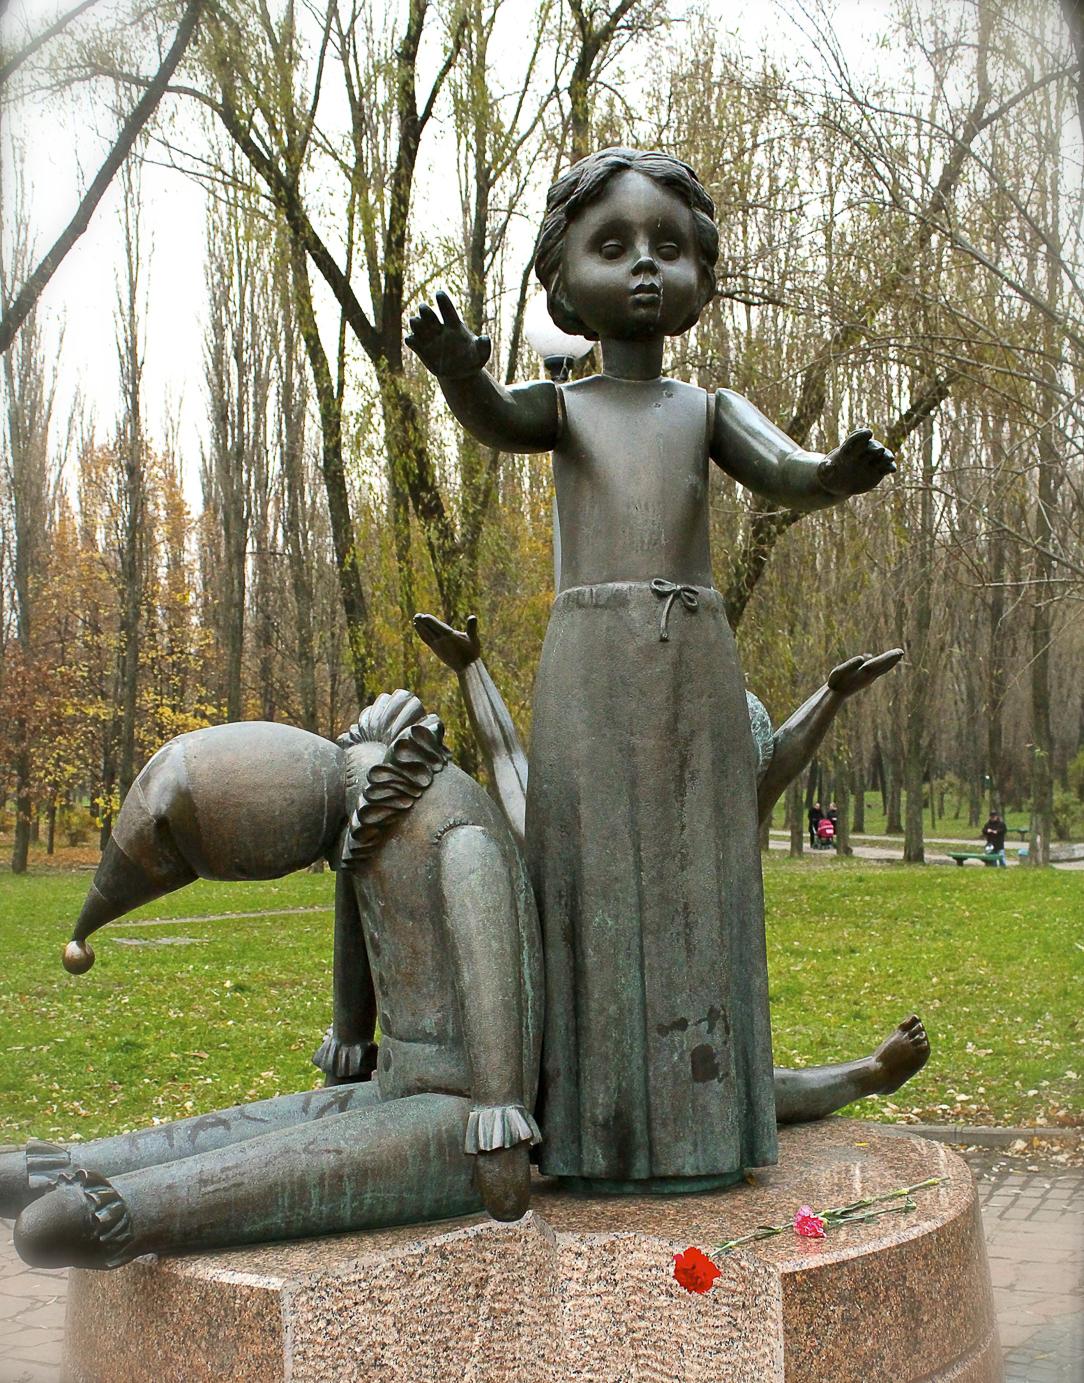 Children's memorial at Babi Yar, Kiev, Ukraine